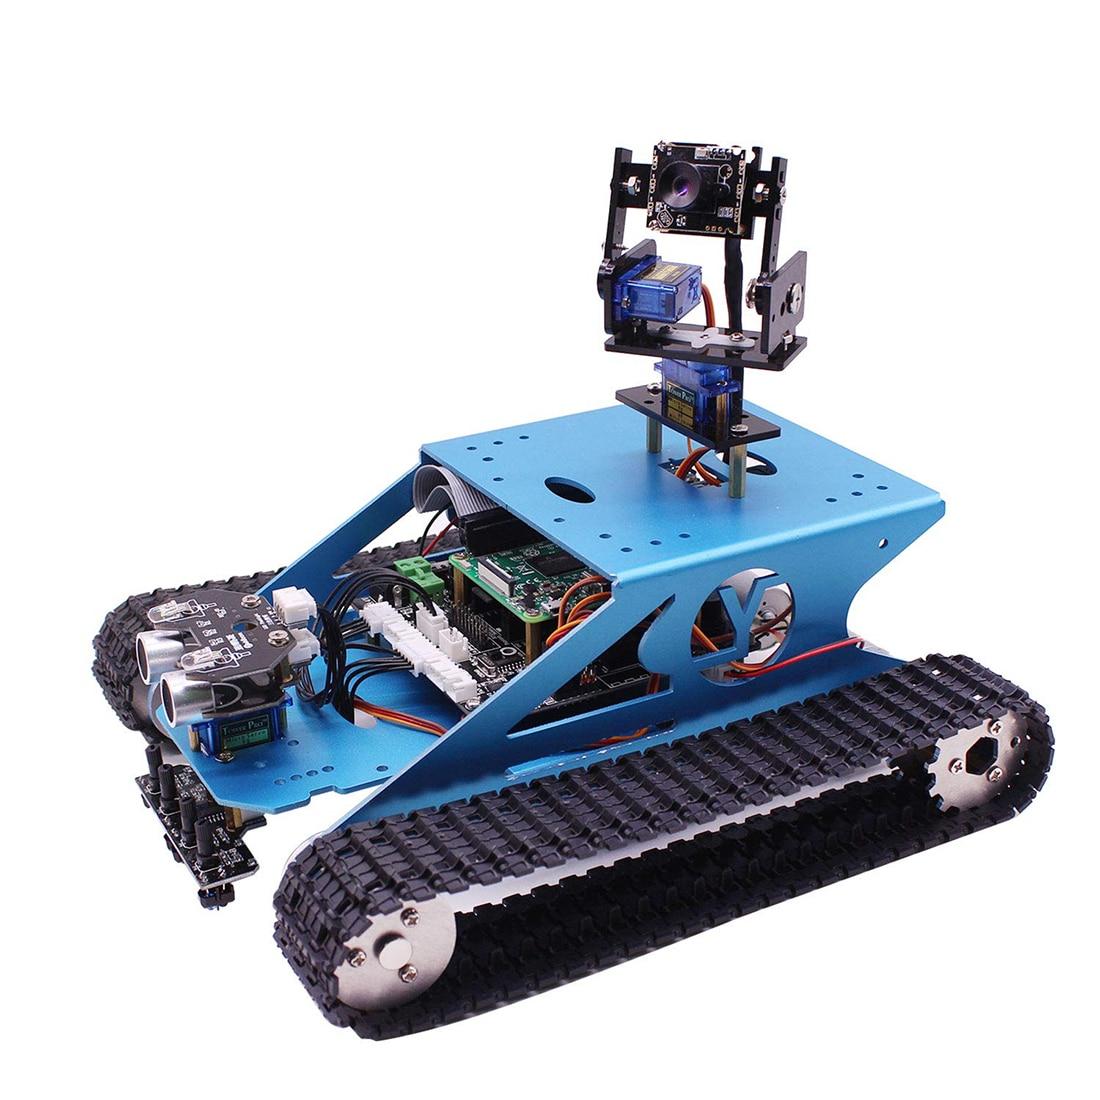 Raspberry Pi Tank Smart DIY Programming Robot Toy Kit WiFi Wireless Video Kids Toy Compatible RPI 3B/3B+(Without Raspberry Pi)